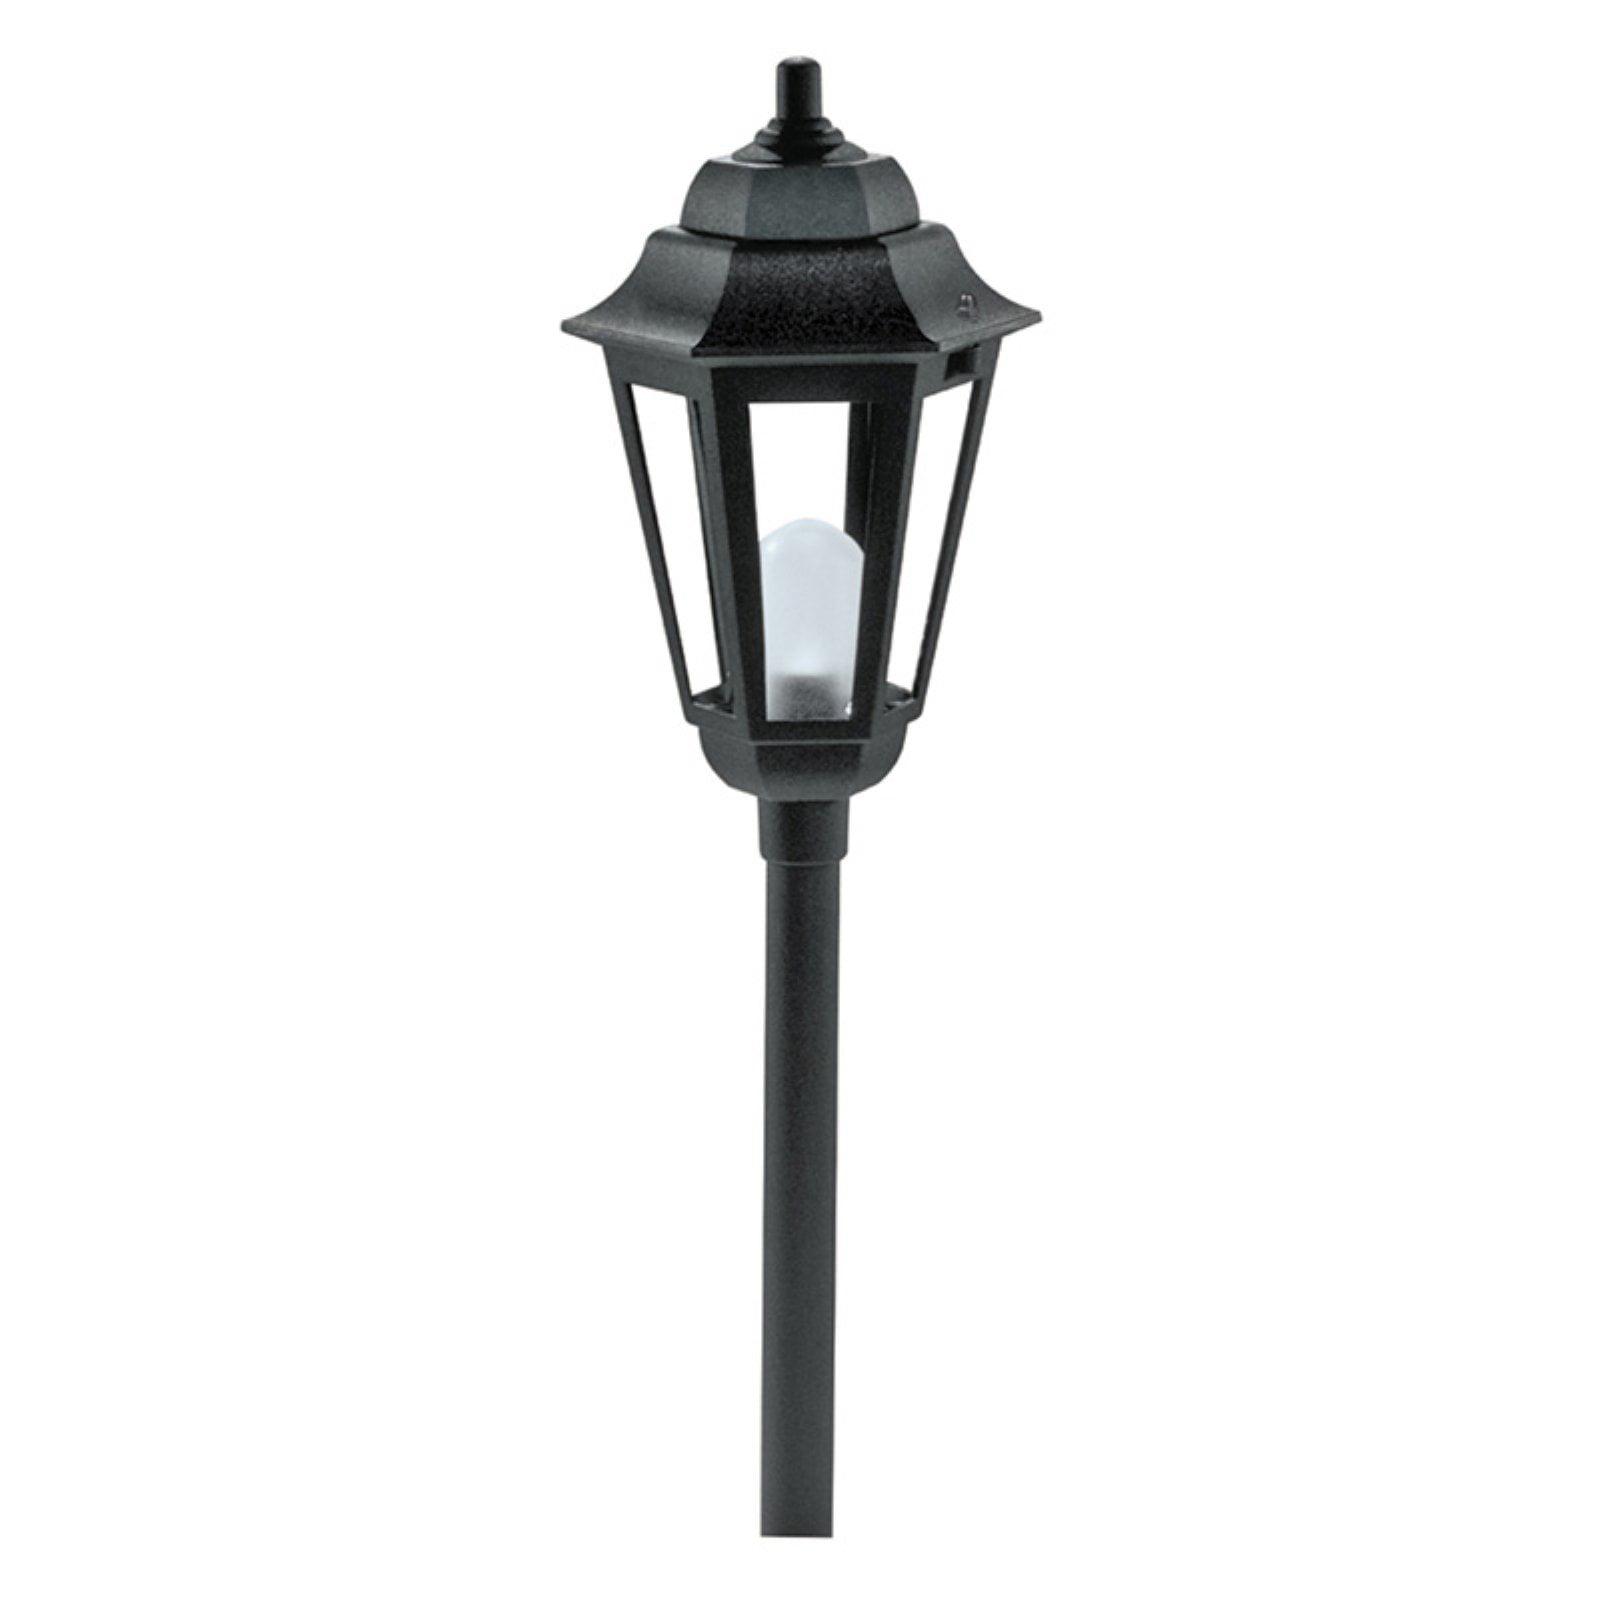 Paradise Garden Lighting Savannah Cast Aluminum 10W Walklight - Black